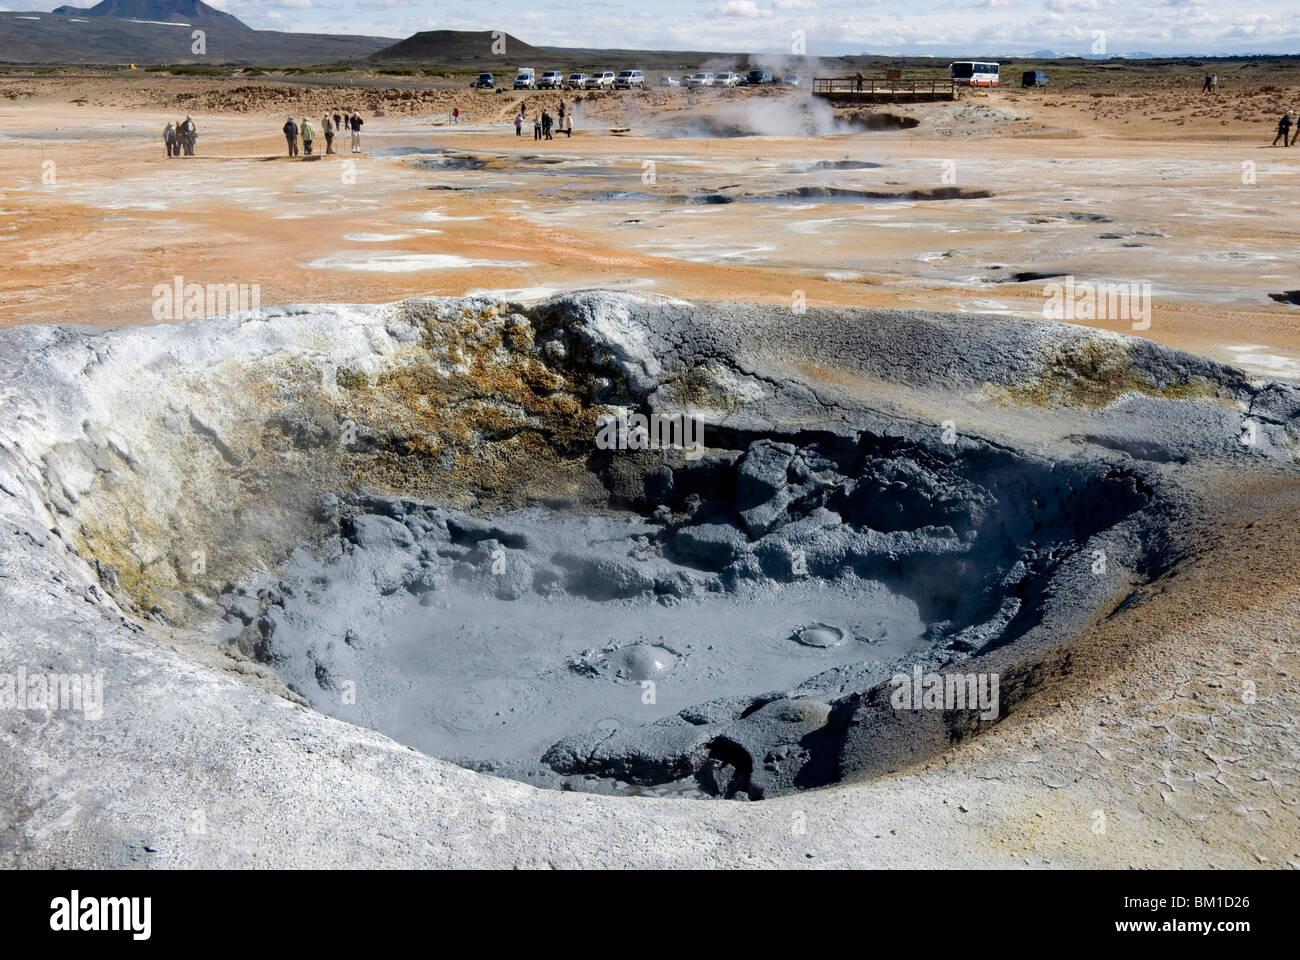 Kochendem Schlamm-Pool, geothermische Namafjall Nähe See Myvatn, Nordosten, Island, Polarregionen Stockbild